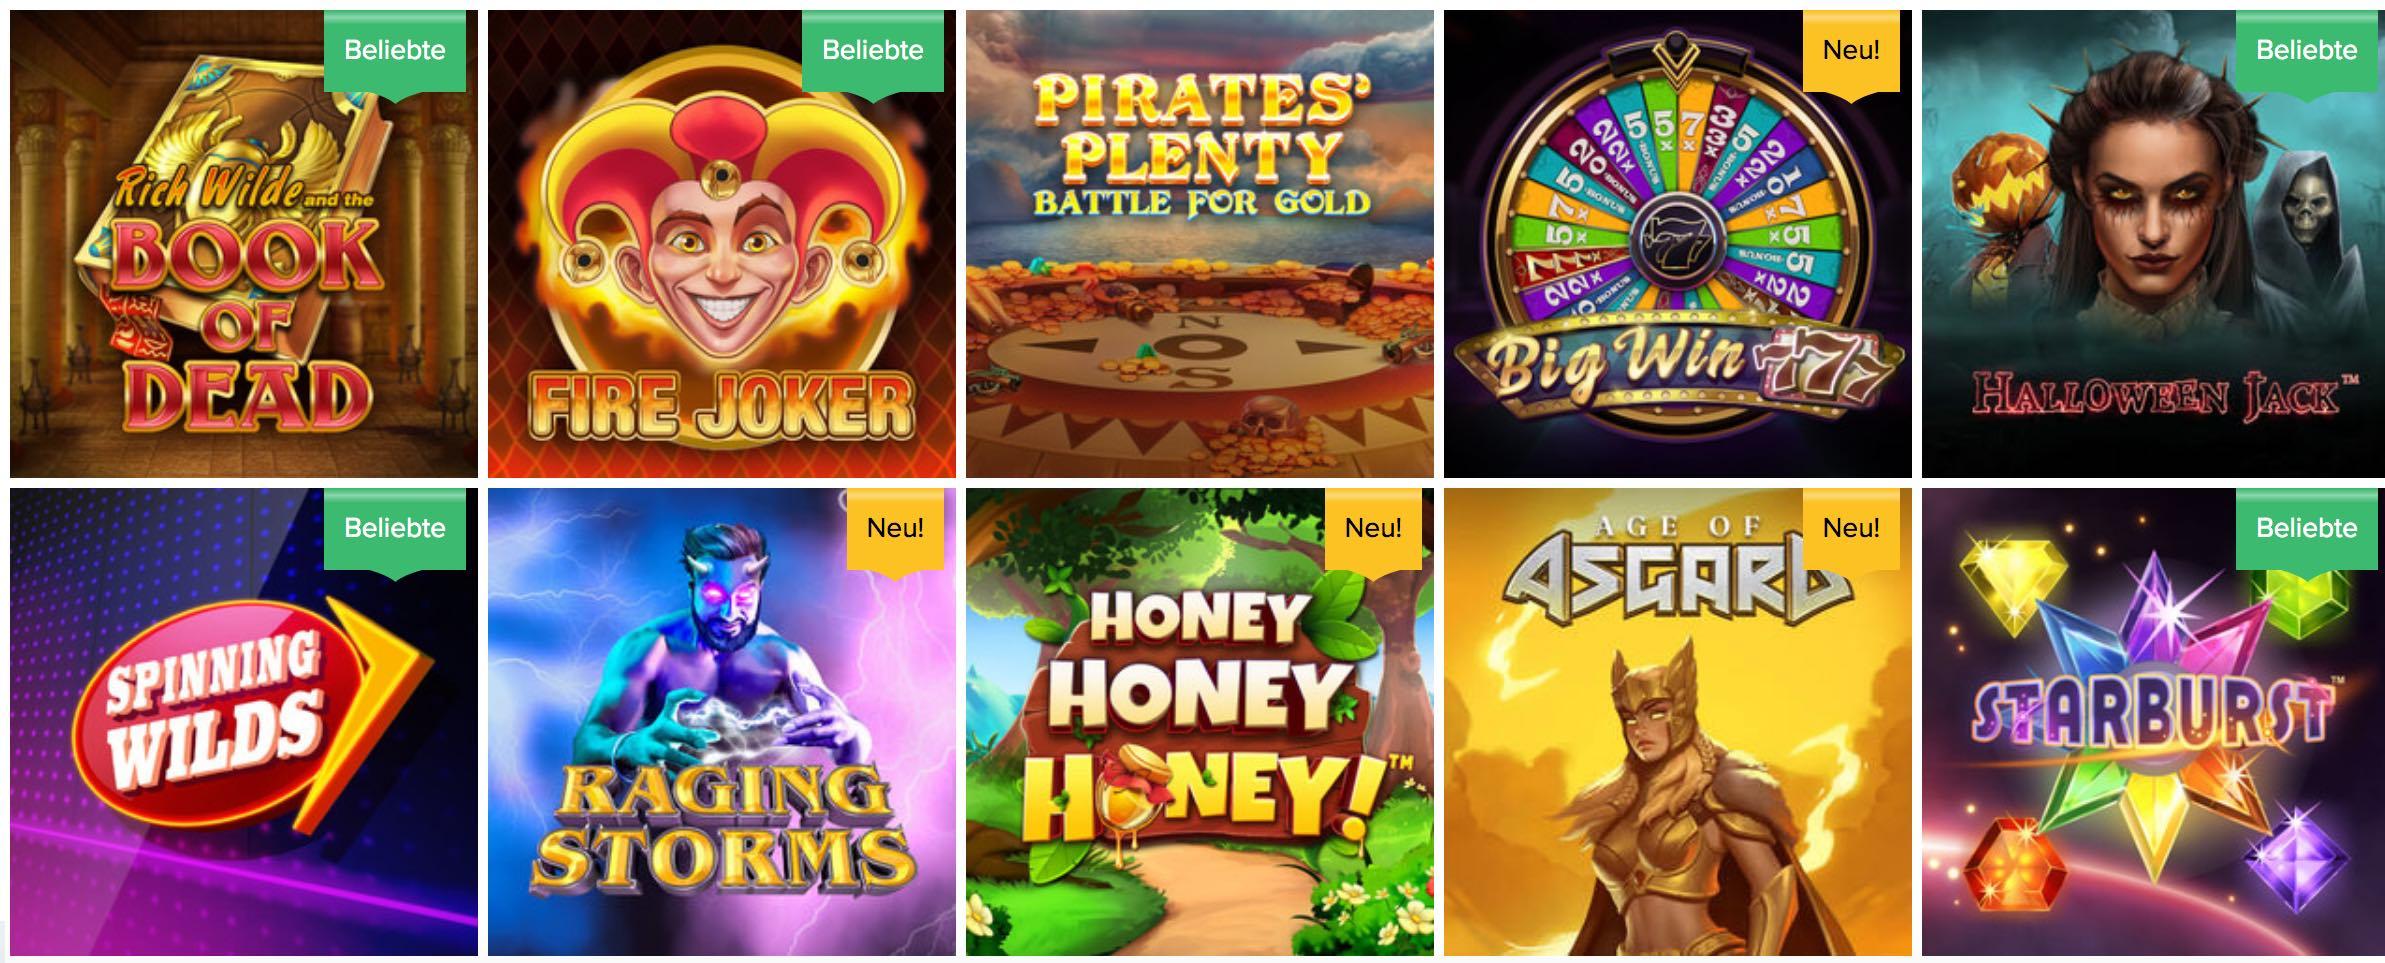 Spielautomaten Spiele